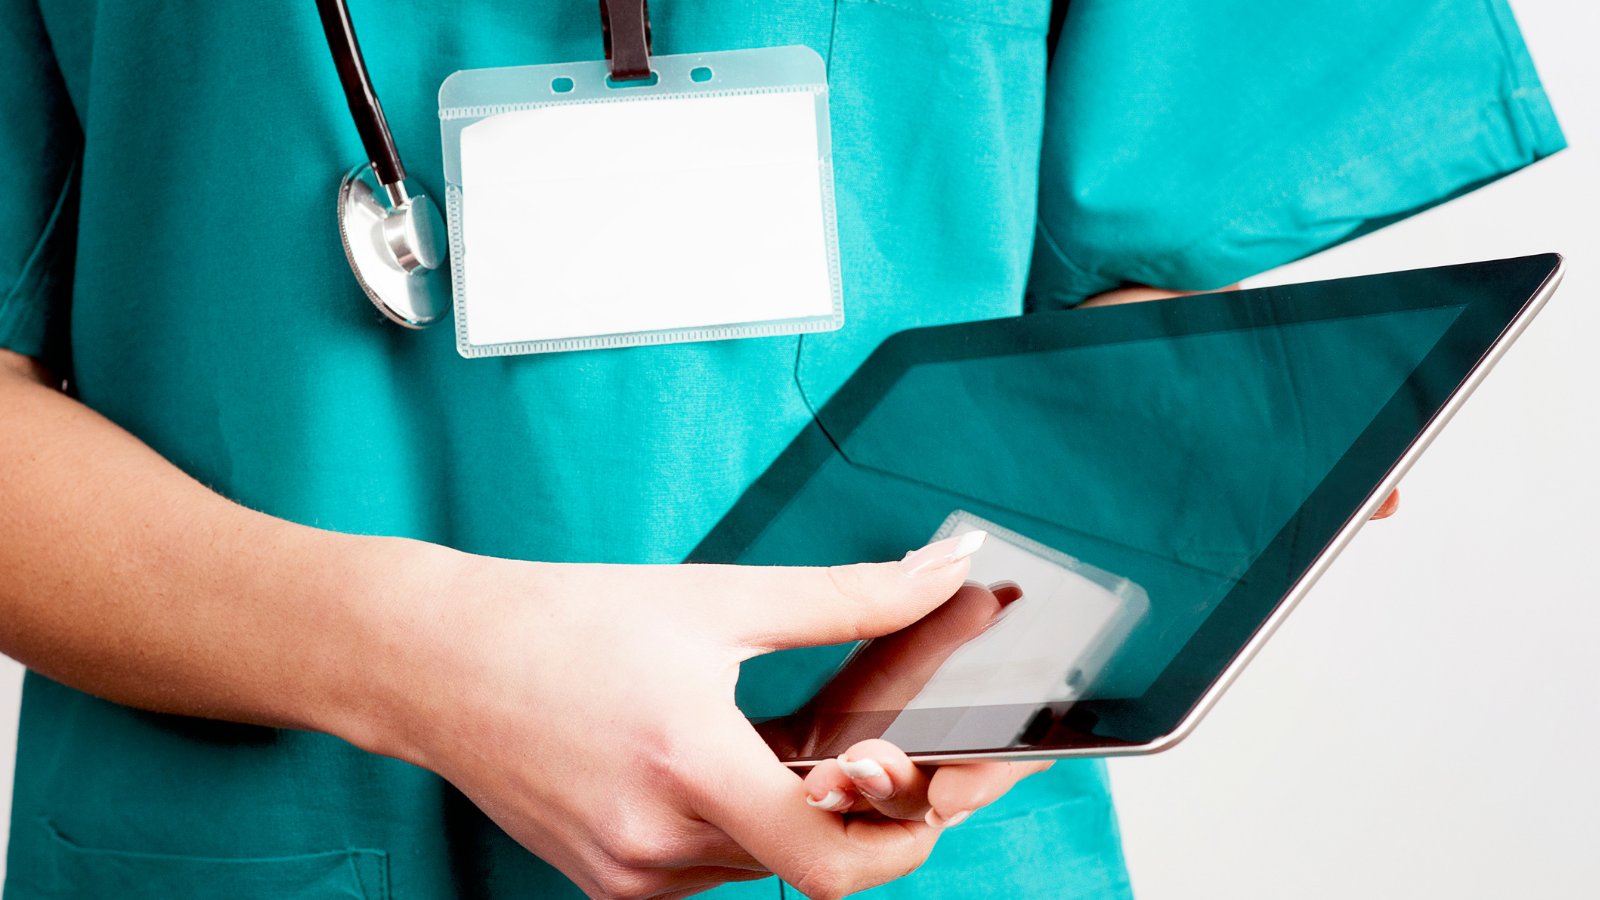 Digital Healthcare, Technology, Patient Care